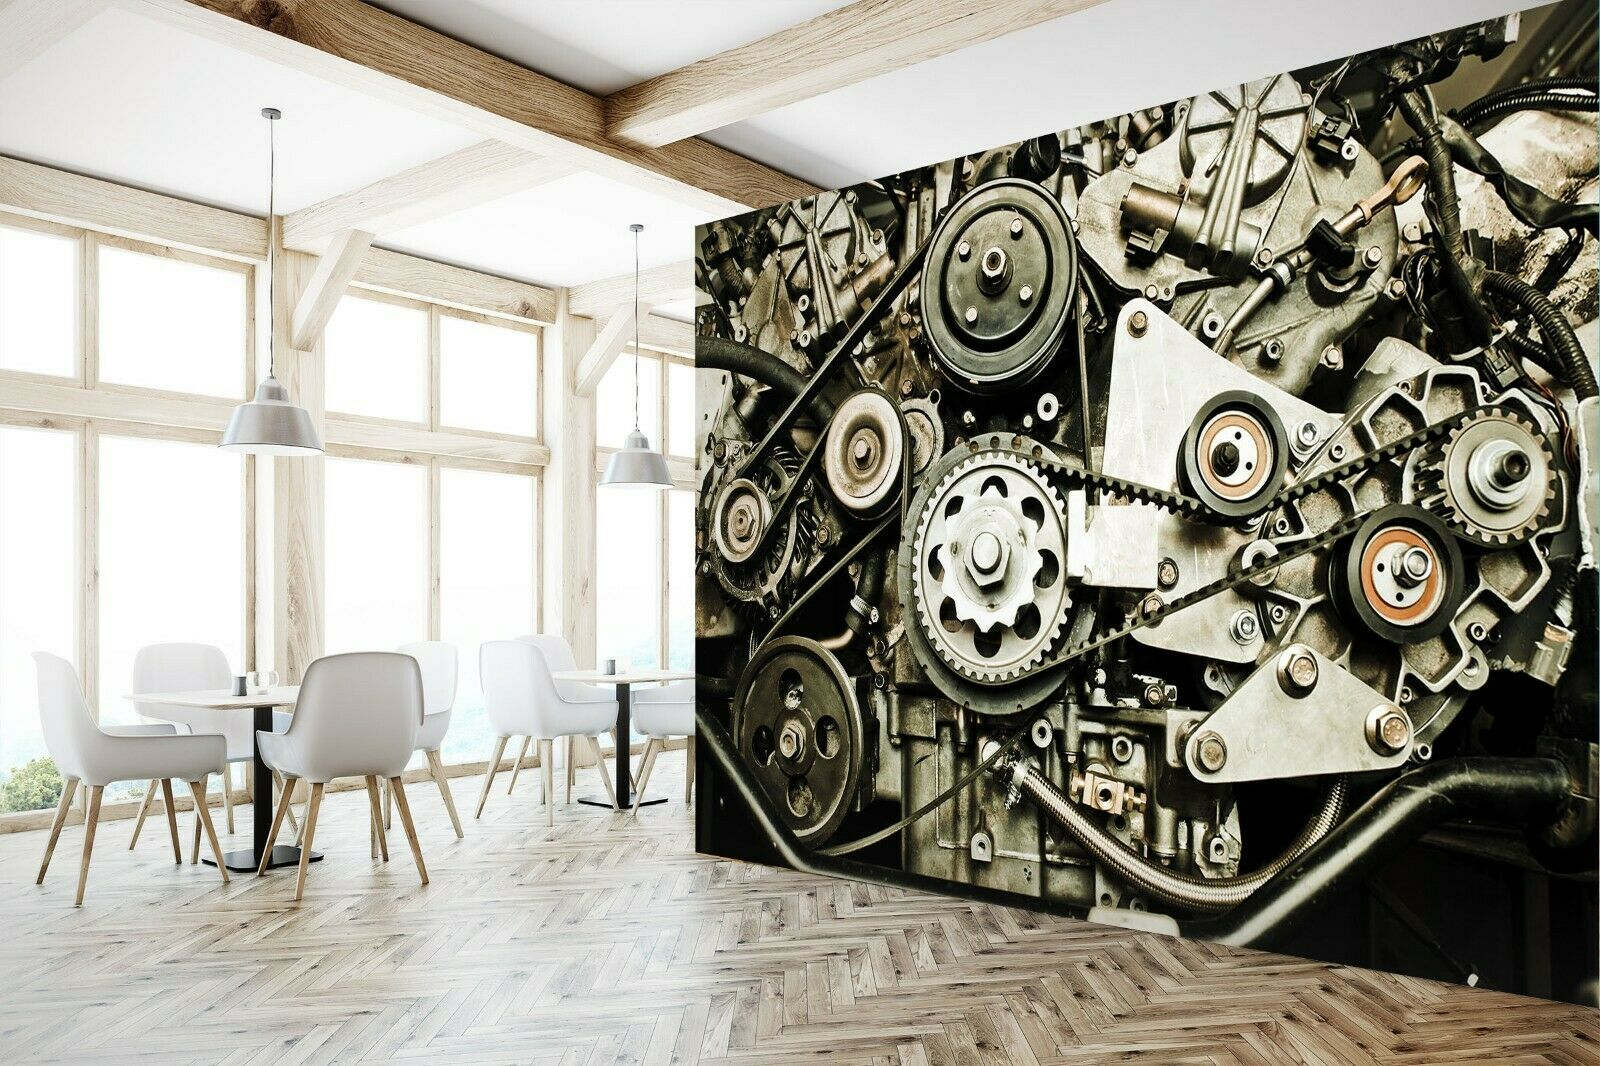 3D Wheel I179 Transport WandPapier Mural Sefl-adhesive Removable Angelia